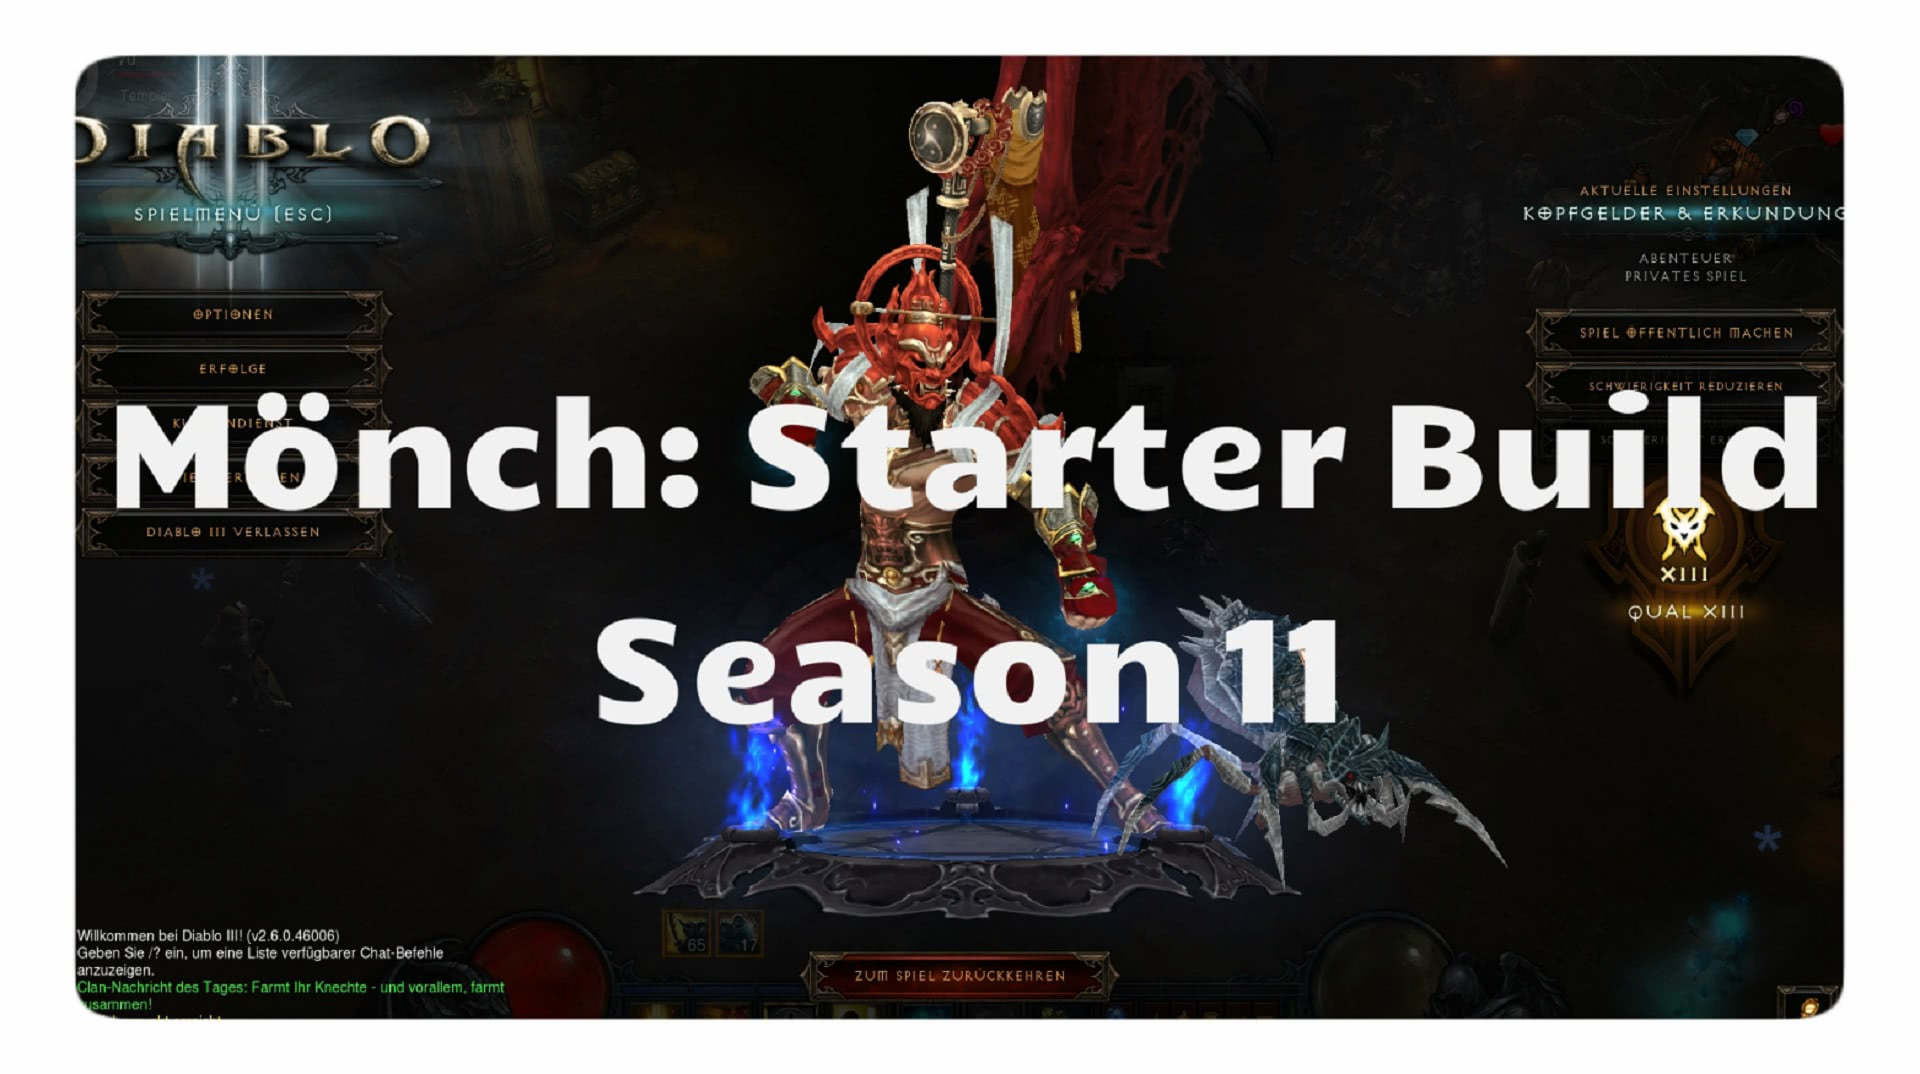 Diablo  Monk Build Season  Paragon